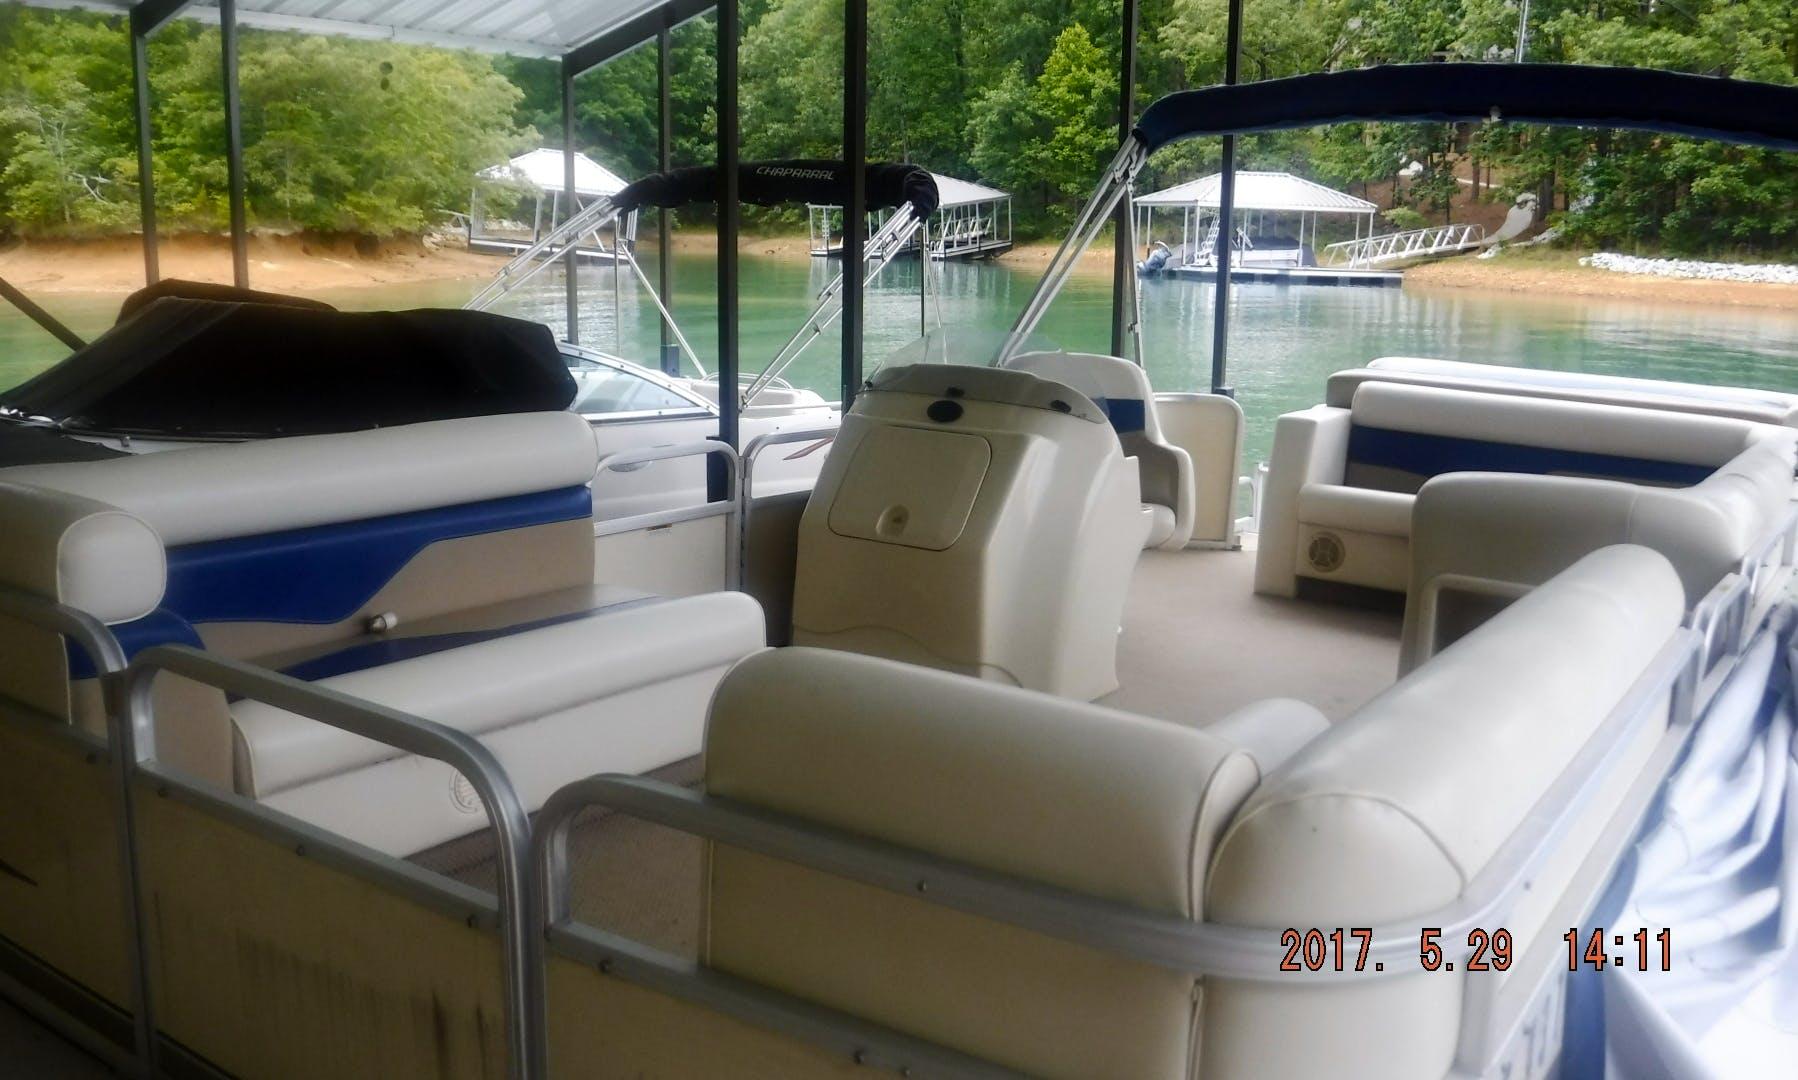 Tuscany Sweetwater Pontoon for Rent on Lake Keowee